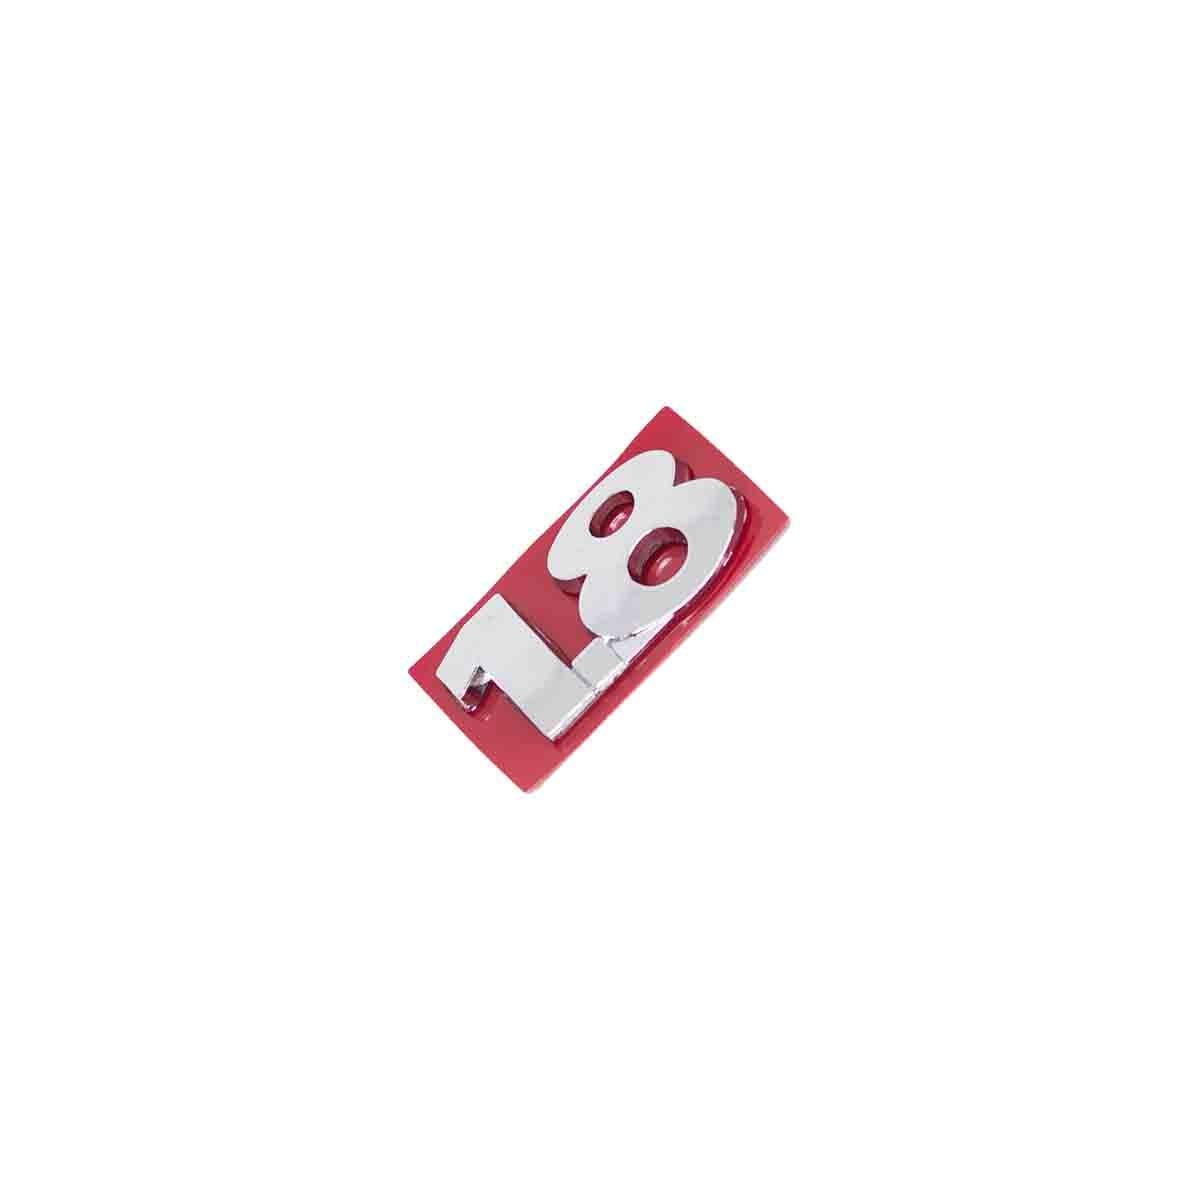 Emblema 1.8 Parati / Saveiro / Passat / Pointer / Bora / Todos G3